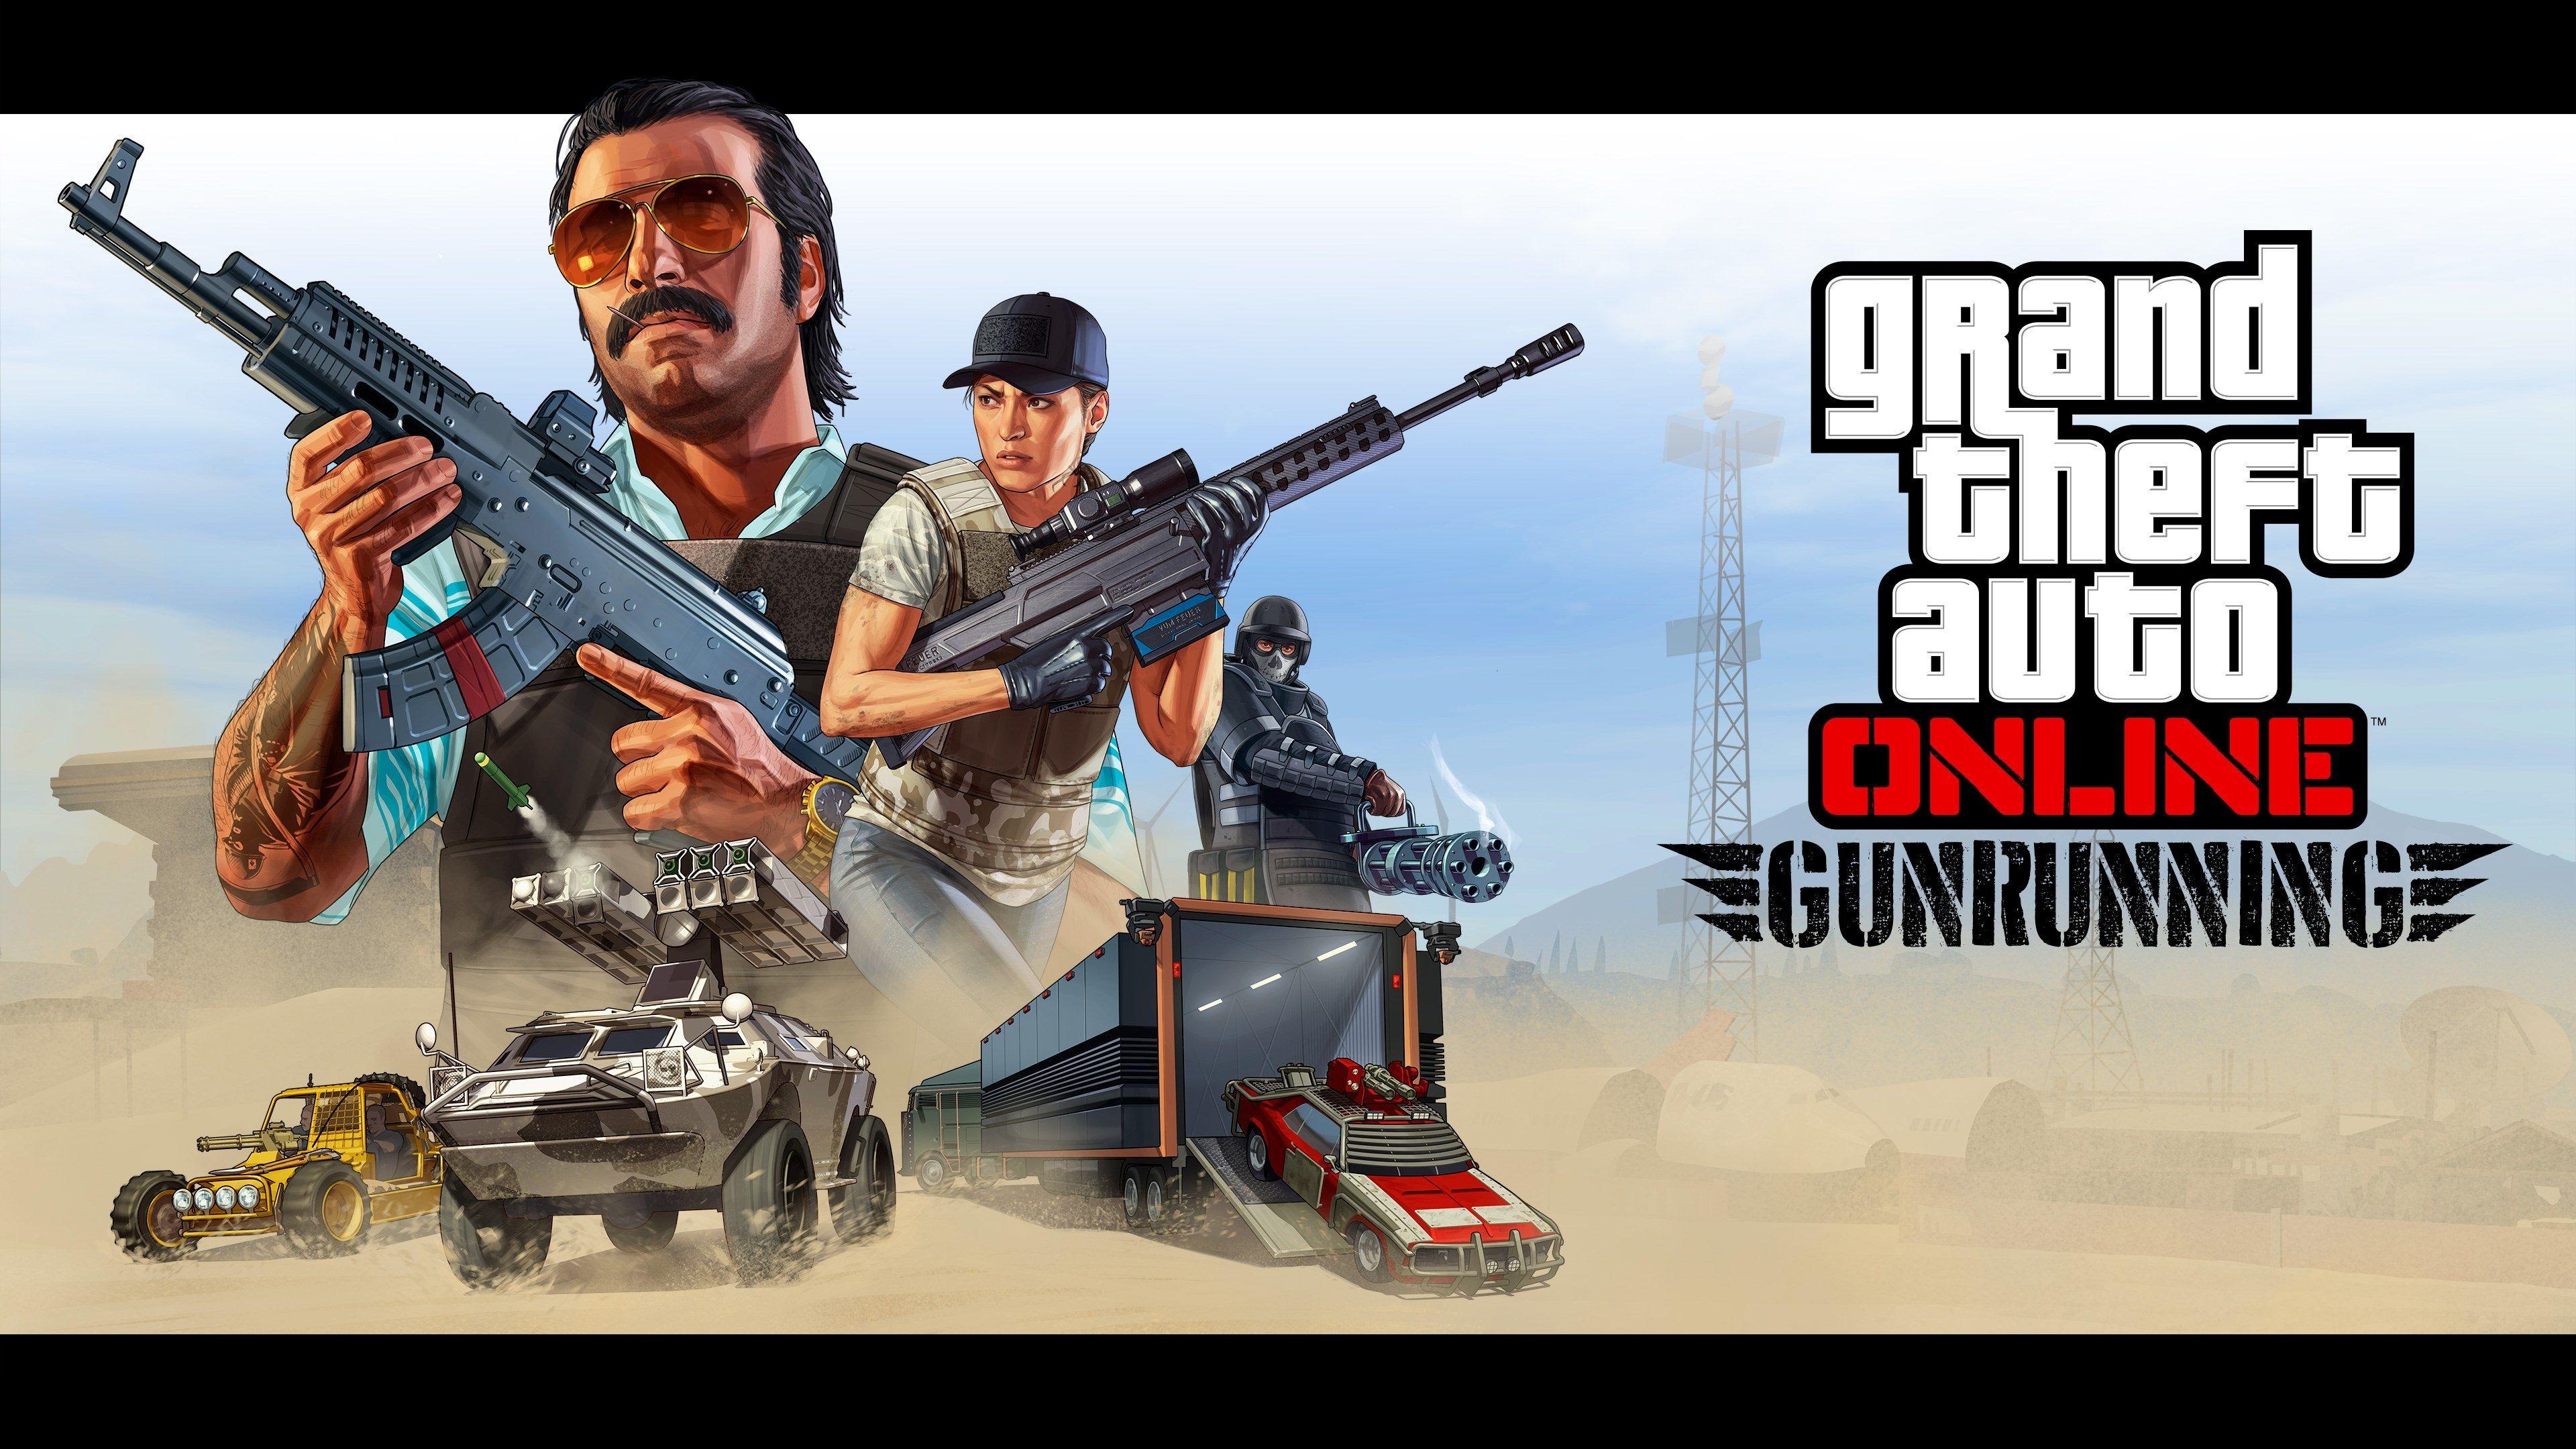 3840x2160 Gta 5 4k Hd Wallpaper For Free Download Gta Online Gta Grand Theft Auto Gta v diamond casion heist wallpaper